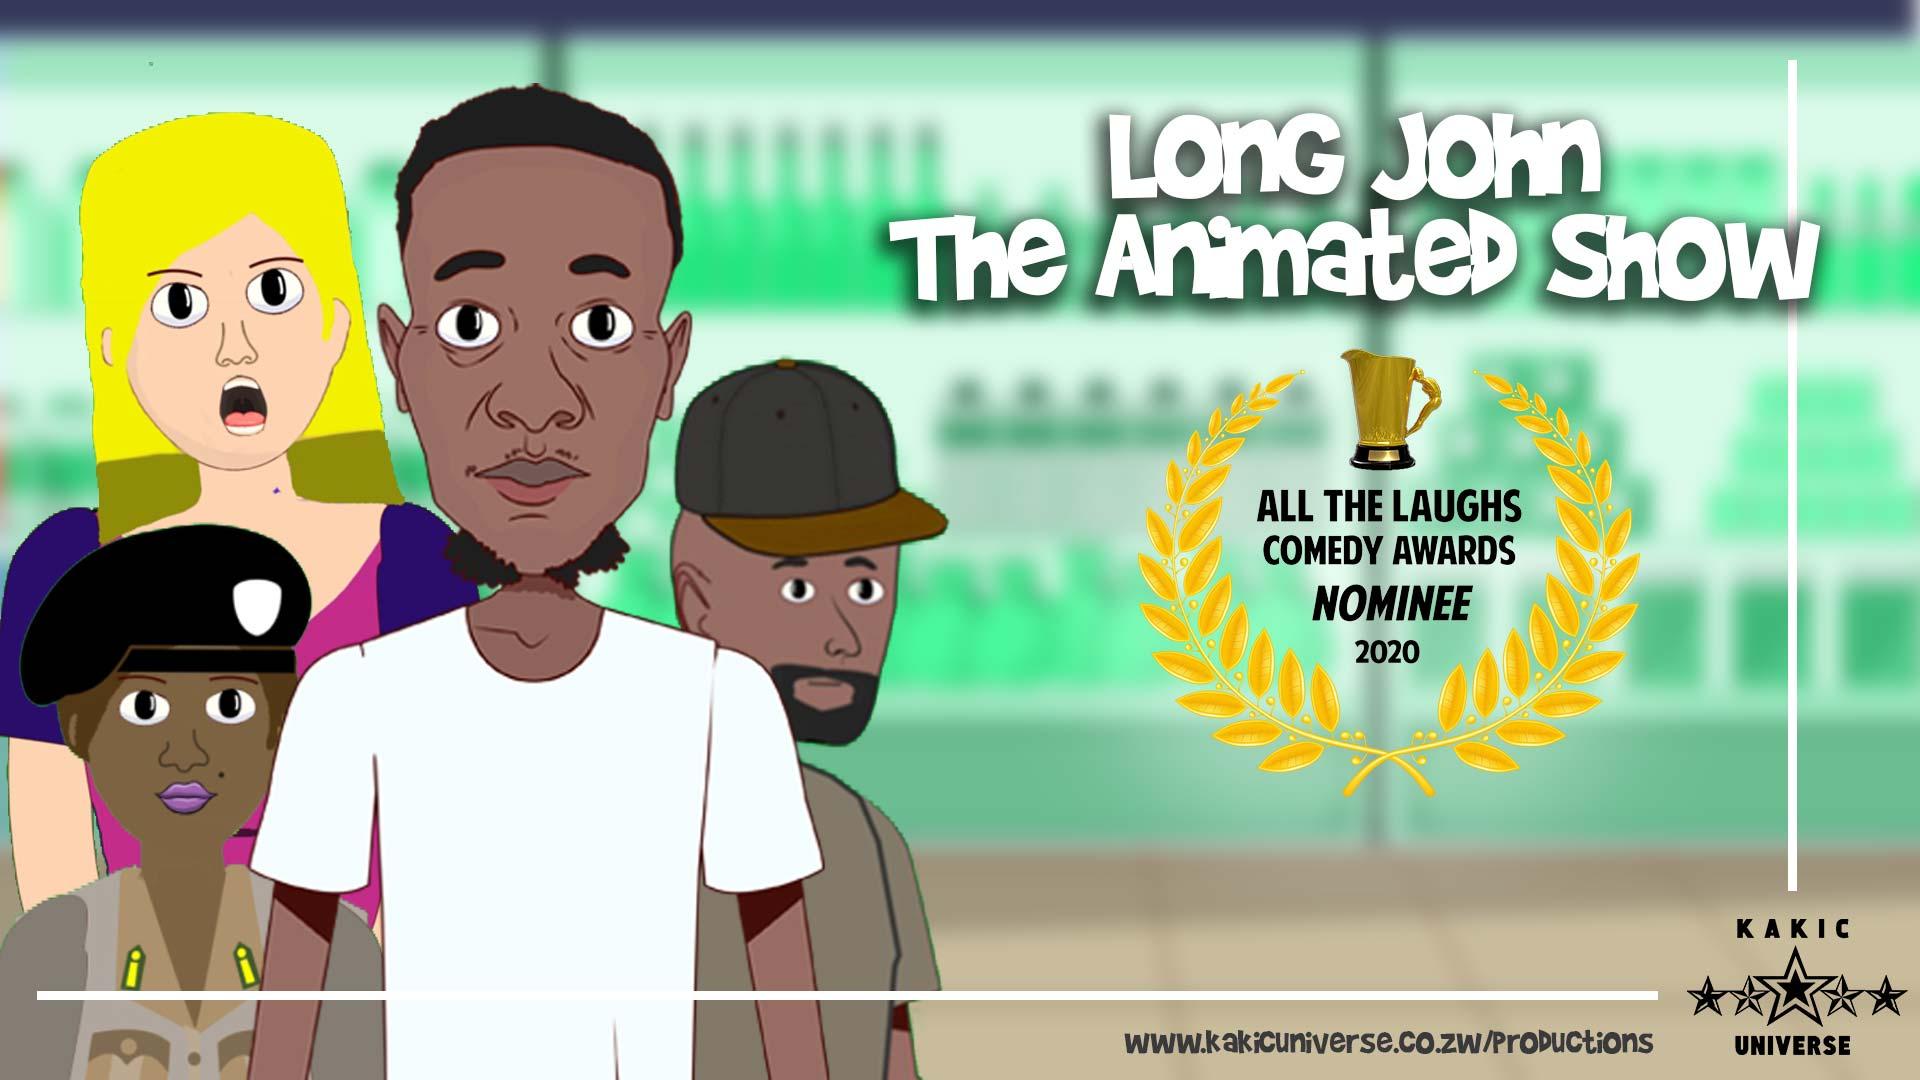 Long JOhn the aniamted show nominated for an award | Zimbabwe Animation | Kakic Universe